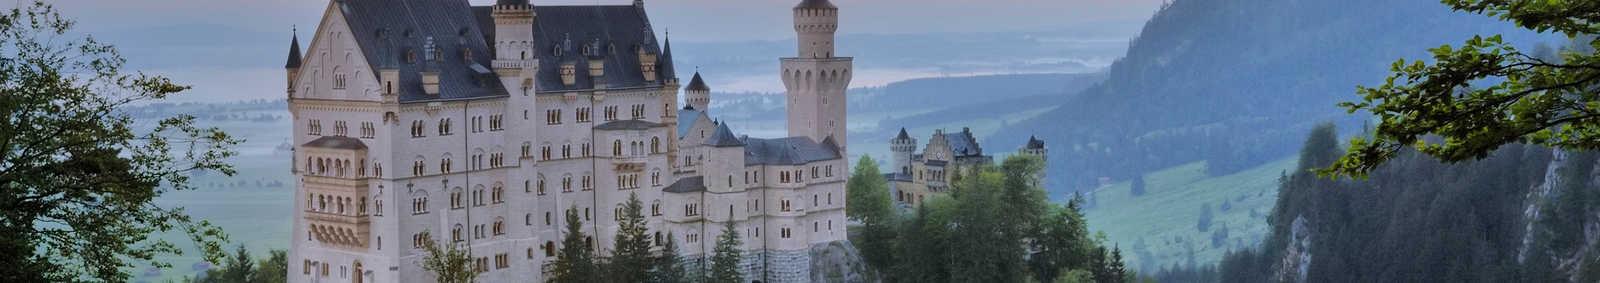 Neunschwanstein Castle at the Dawn, Germany